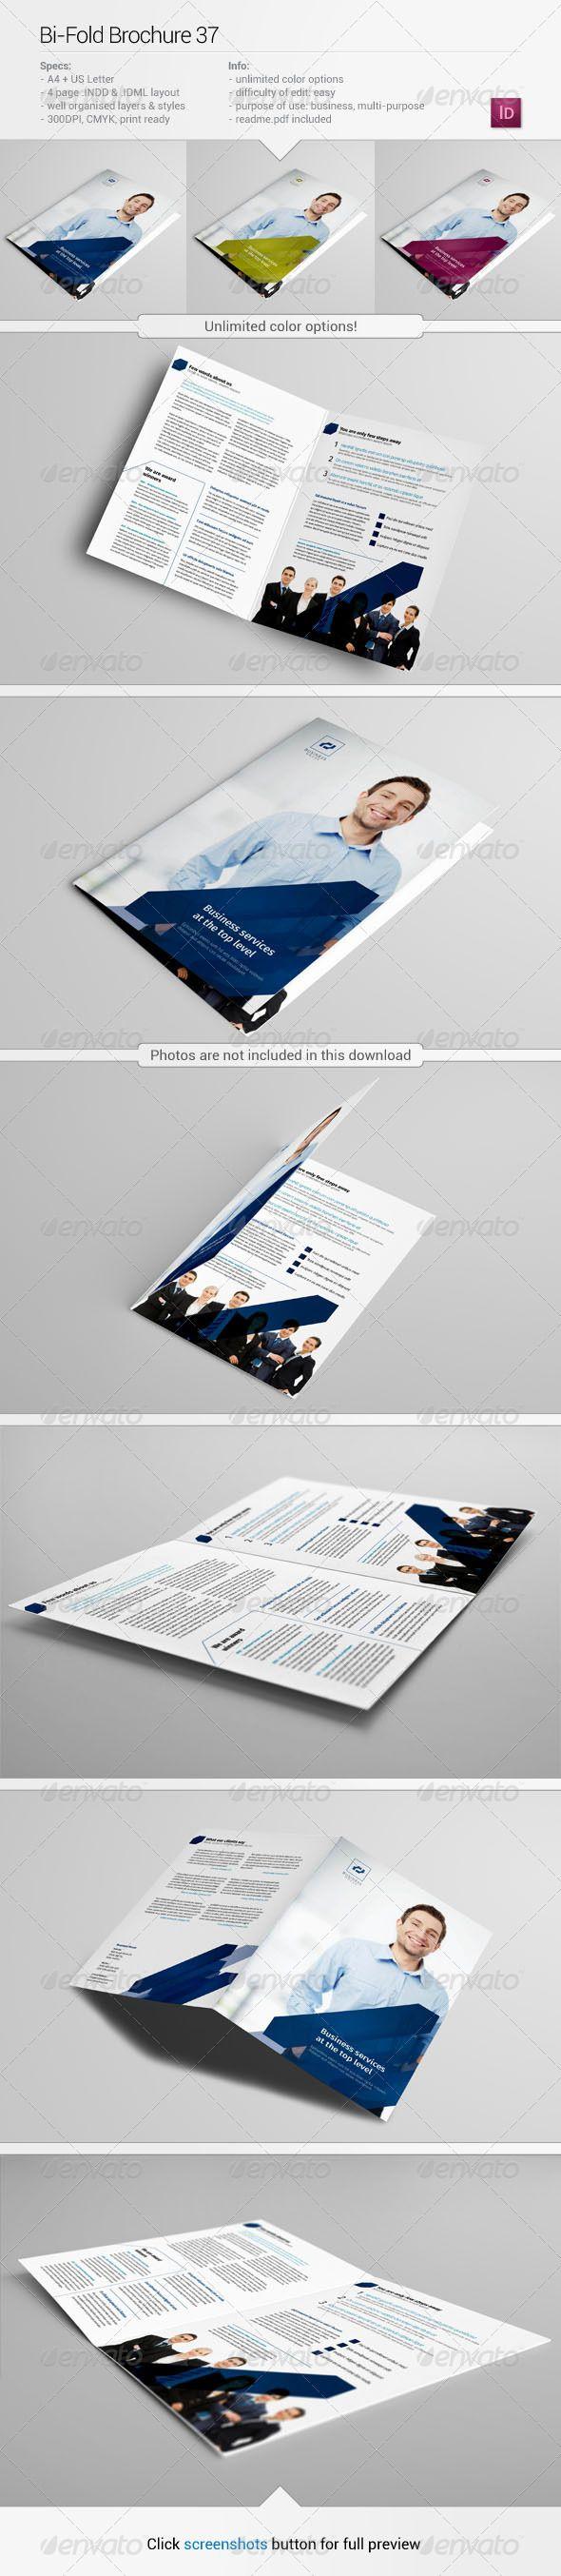 Template Formal Letter%0A BiFold Brochure